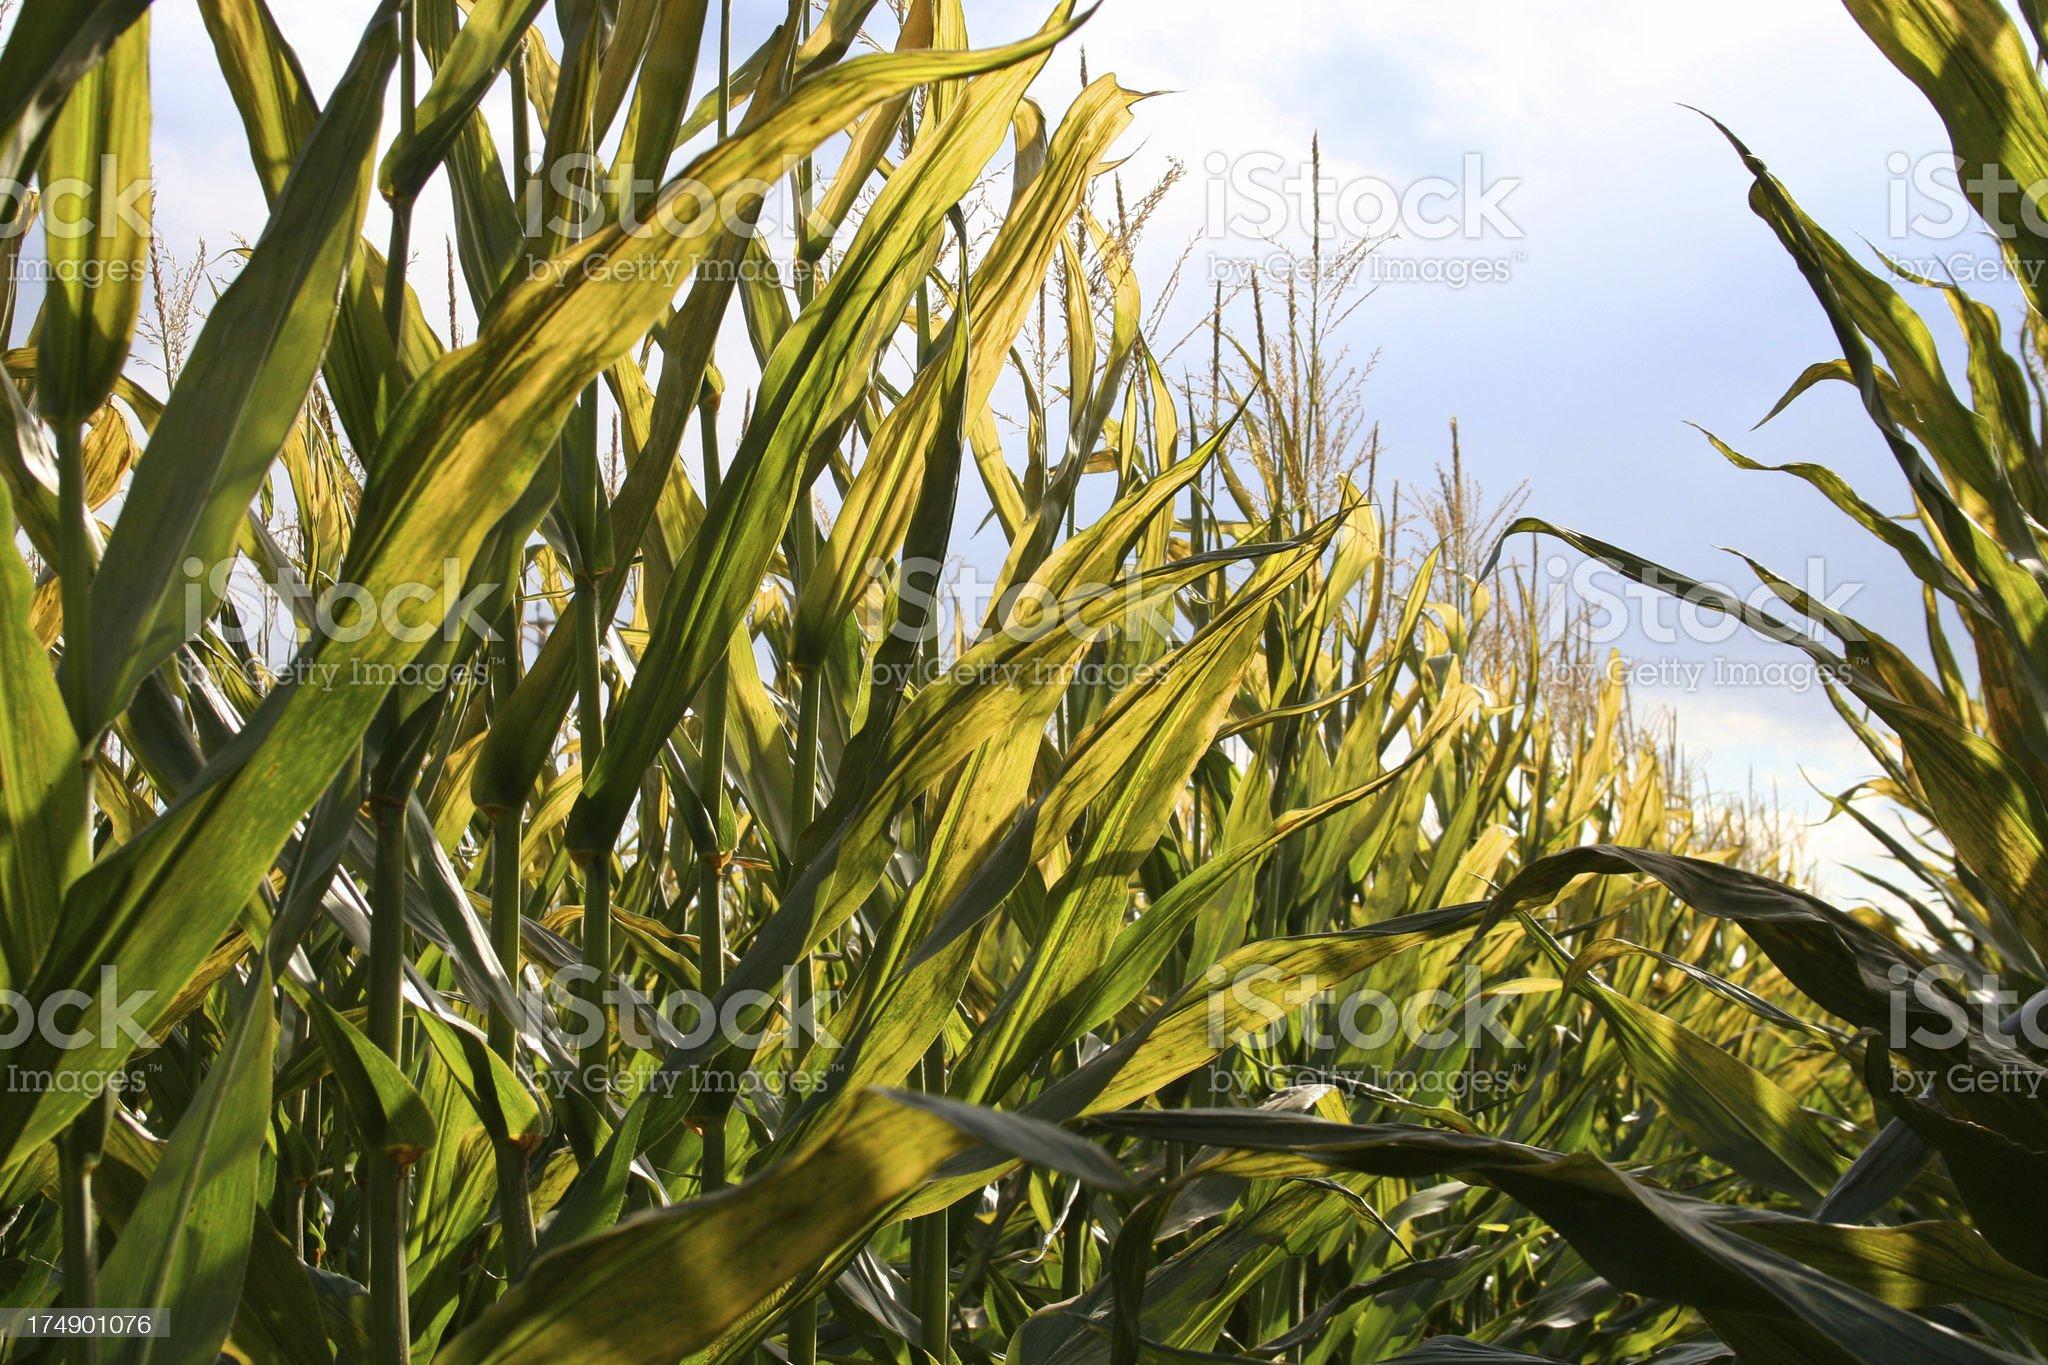 Heavenly harvest royalty-free stock photo